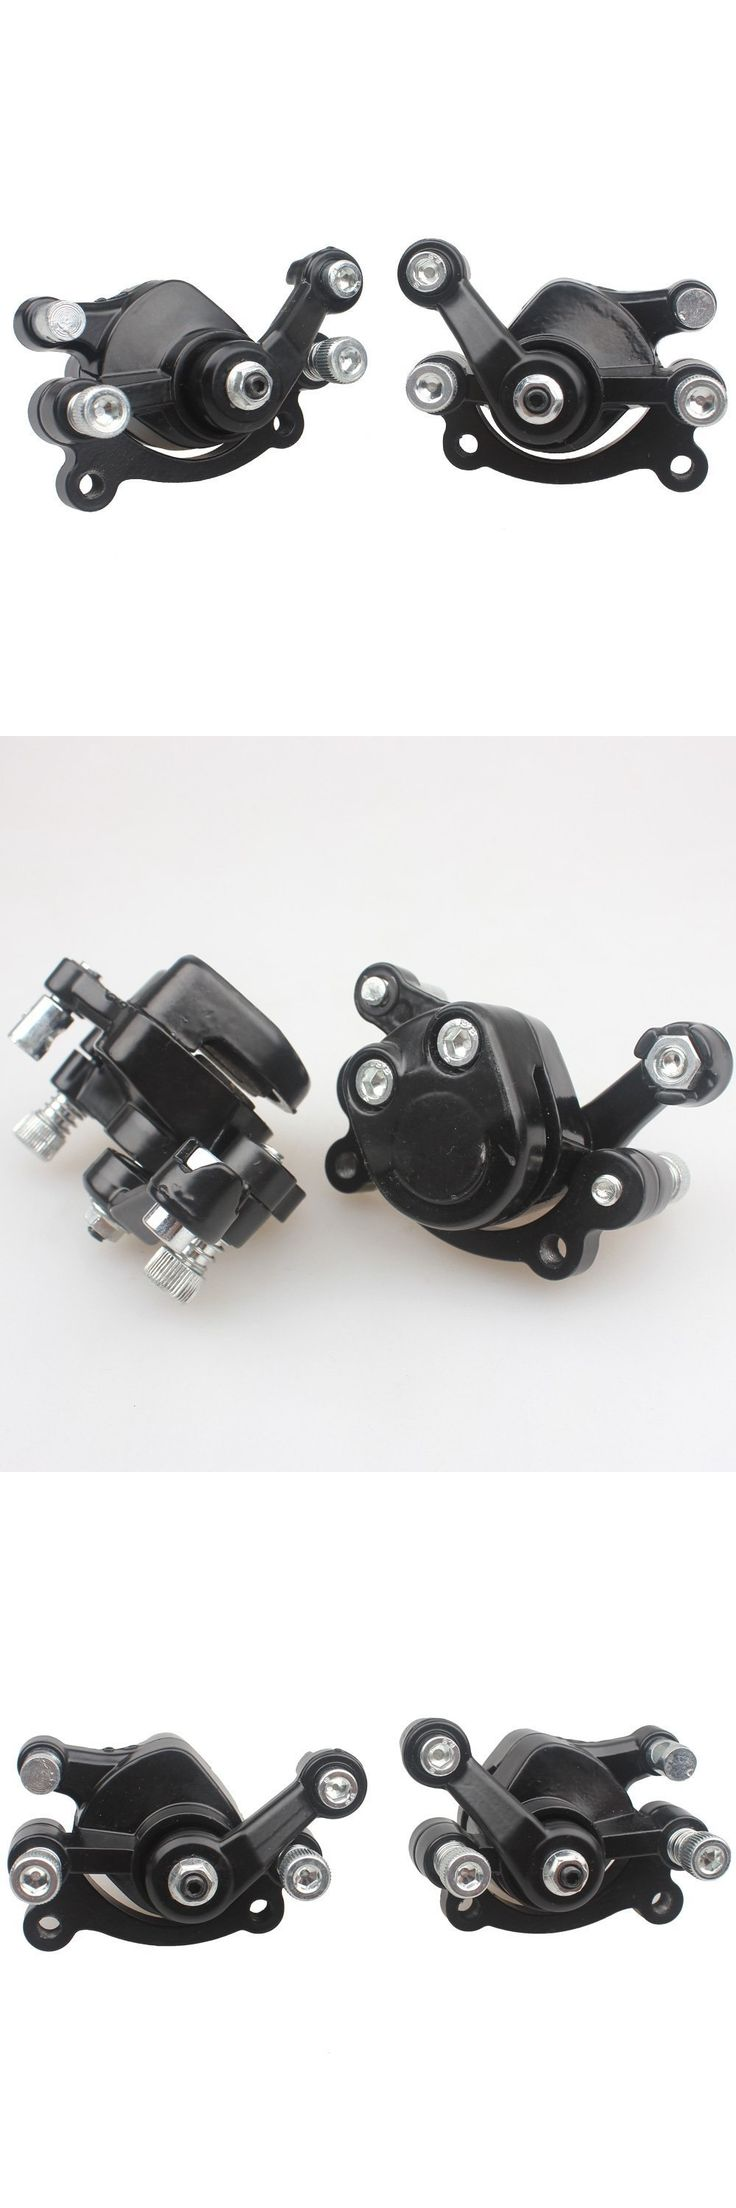 MYMotor Brake Caliper Front and Rear 49cc Pocket Bike Mini Moto